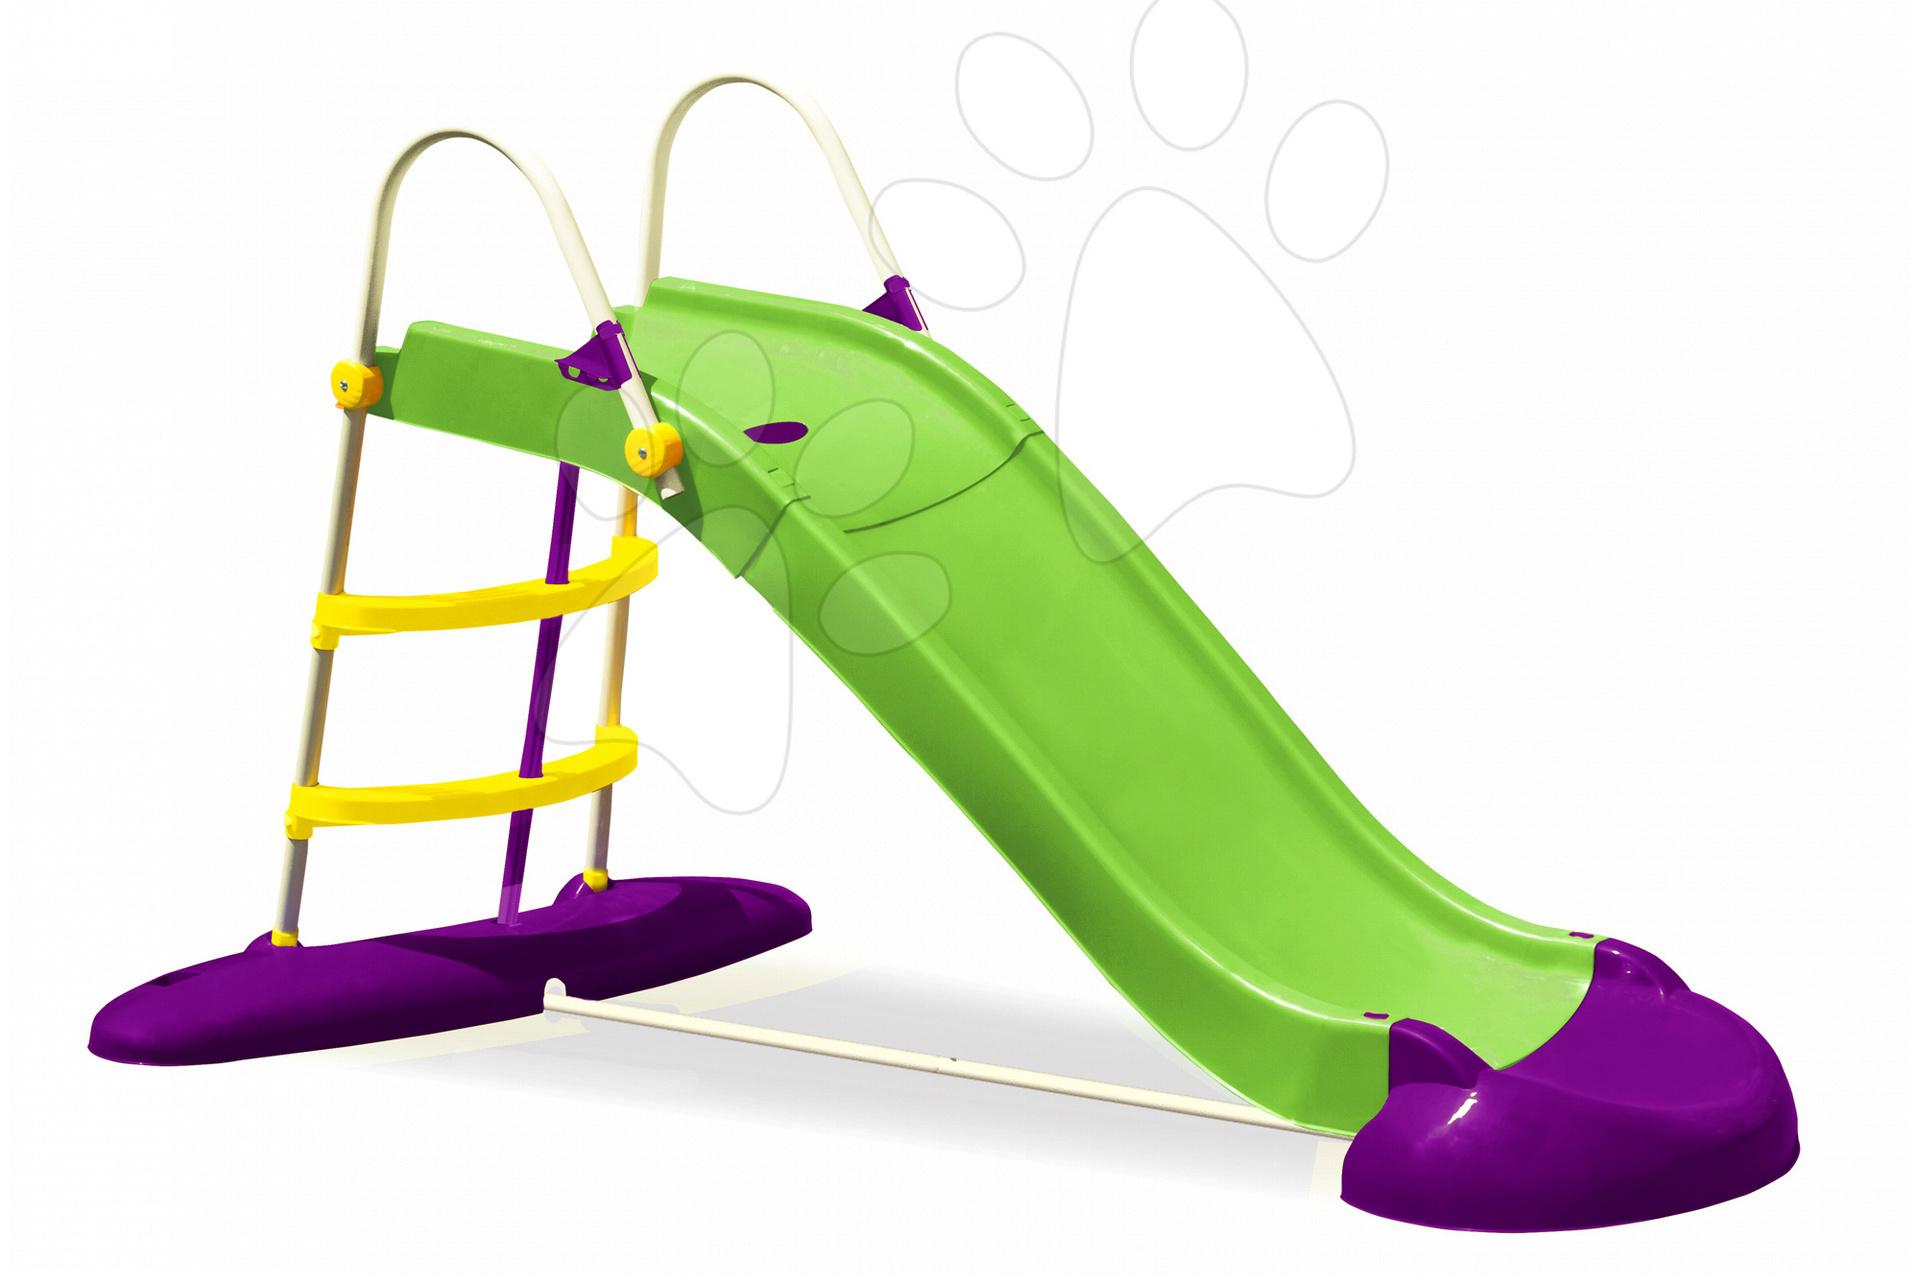 Skluzavka Fun Slide PalPlay 220 cm s vodu zeleno-fialová